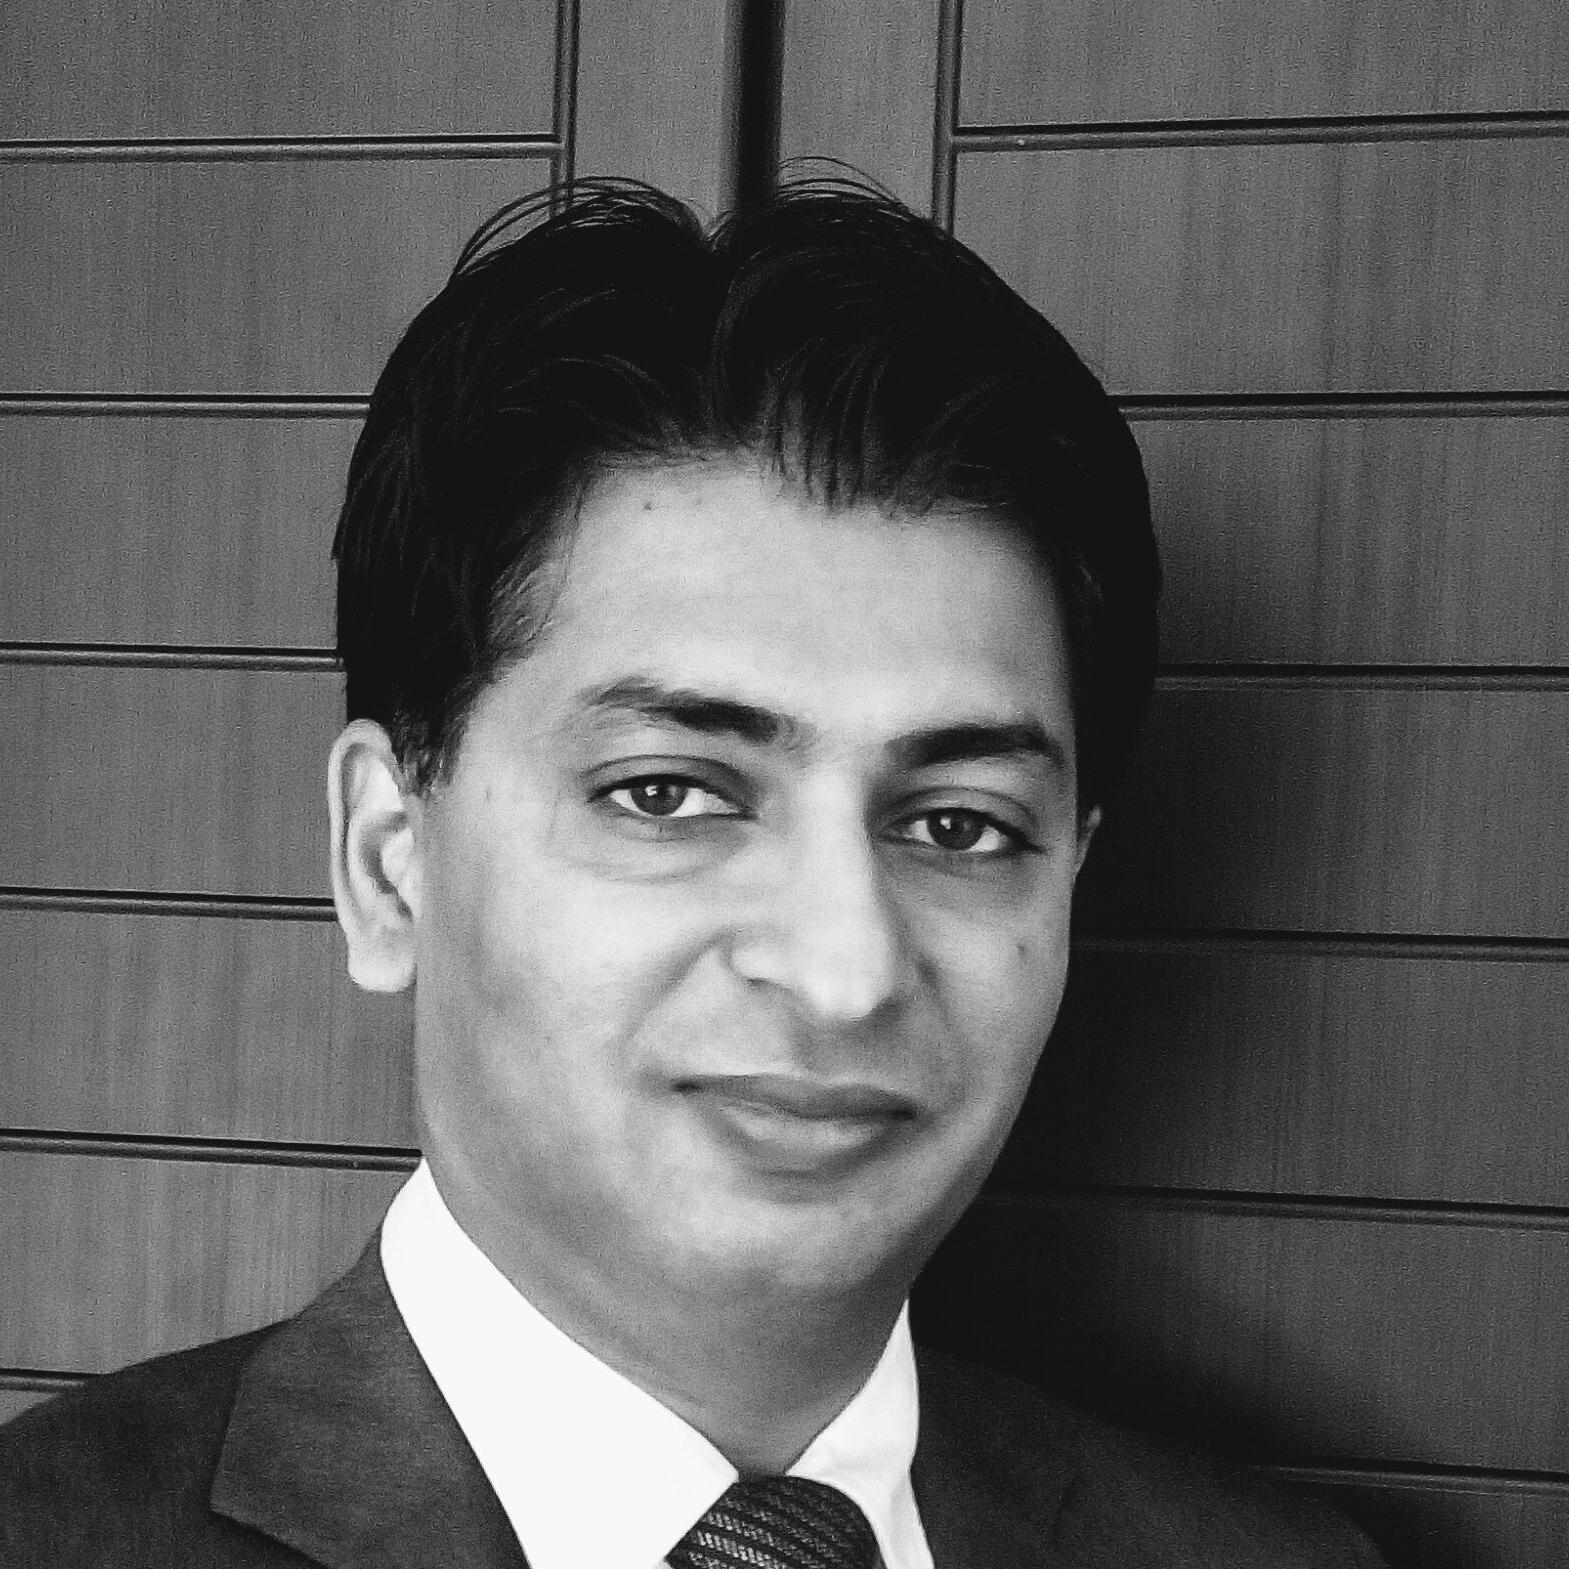 Nishant Govil